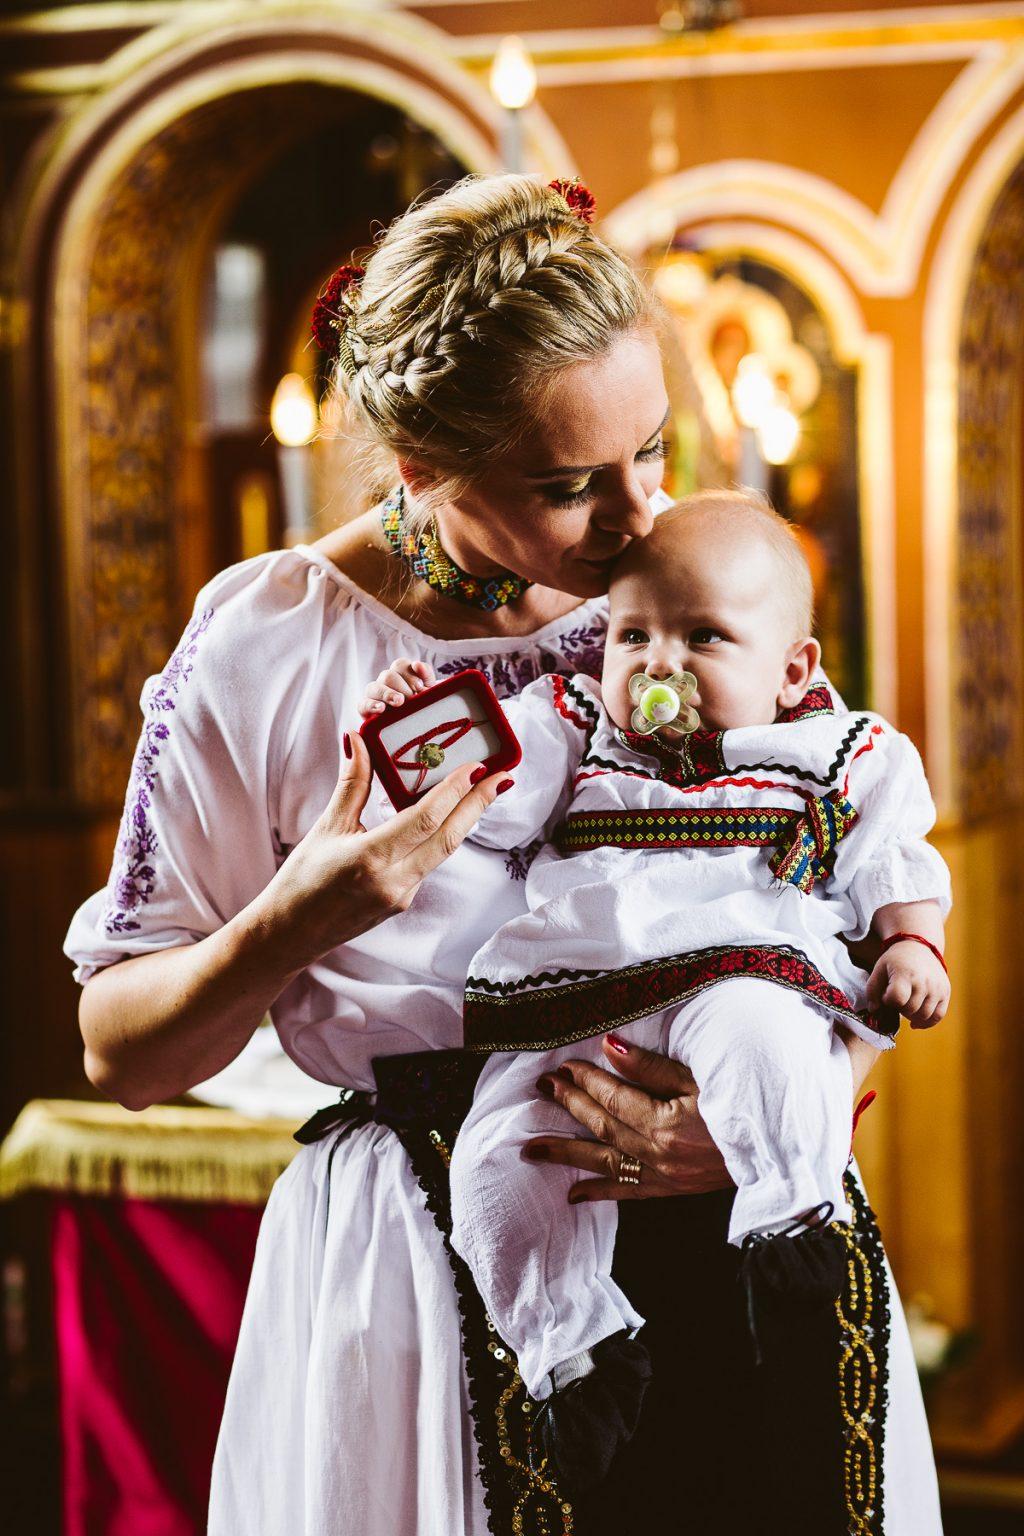 fotograf profesionist botez targu mures cluj bucuresti professional wedding photographer christening baptism destination transylvania